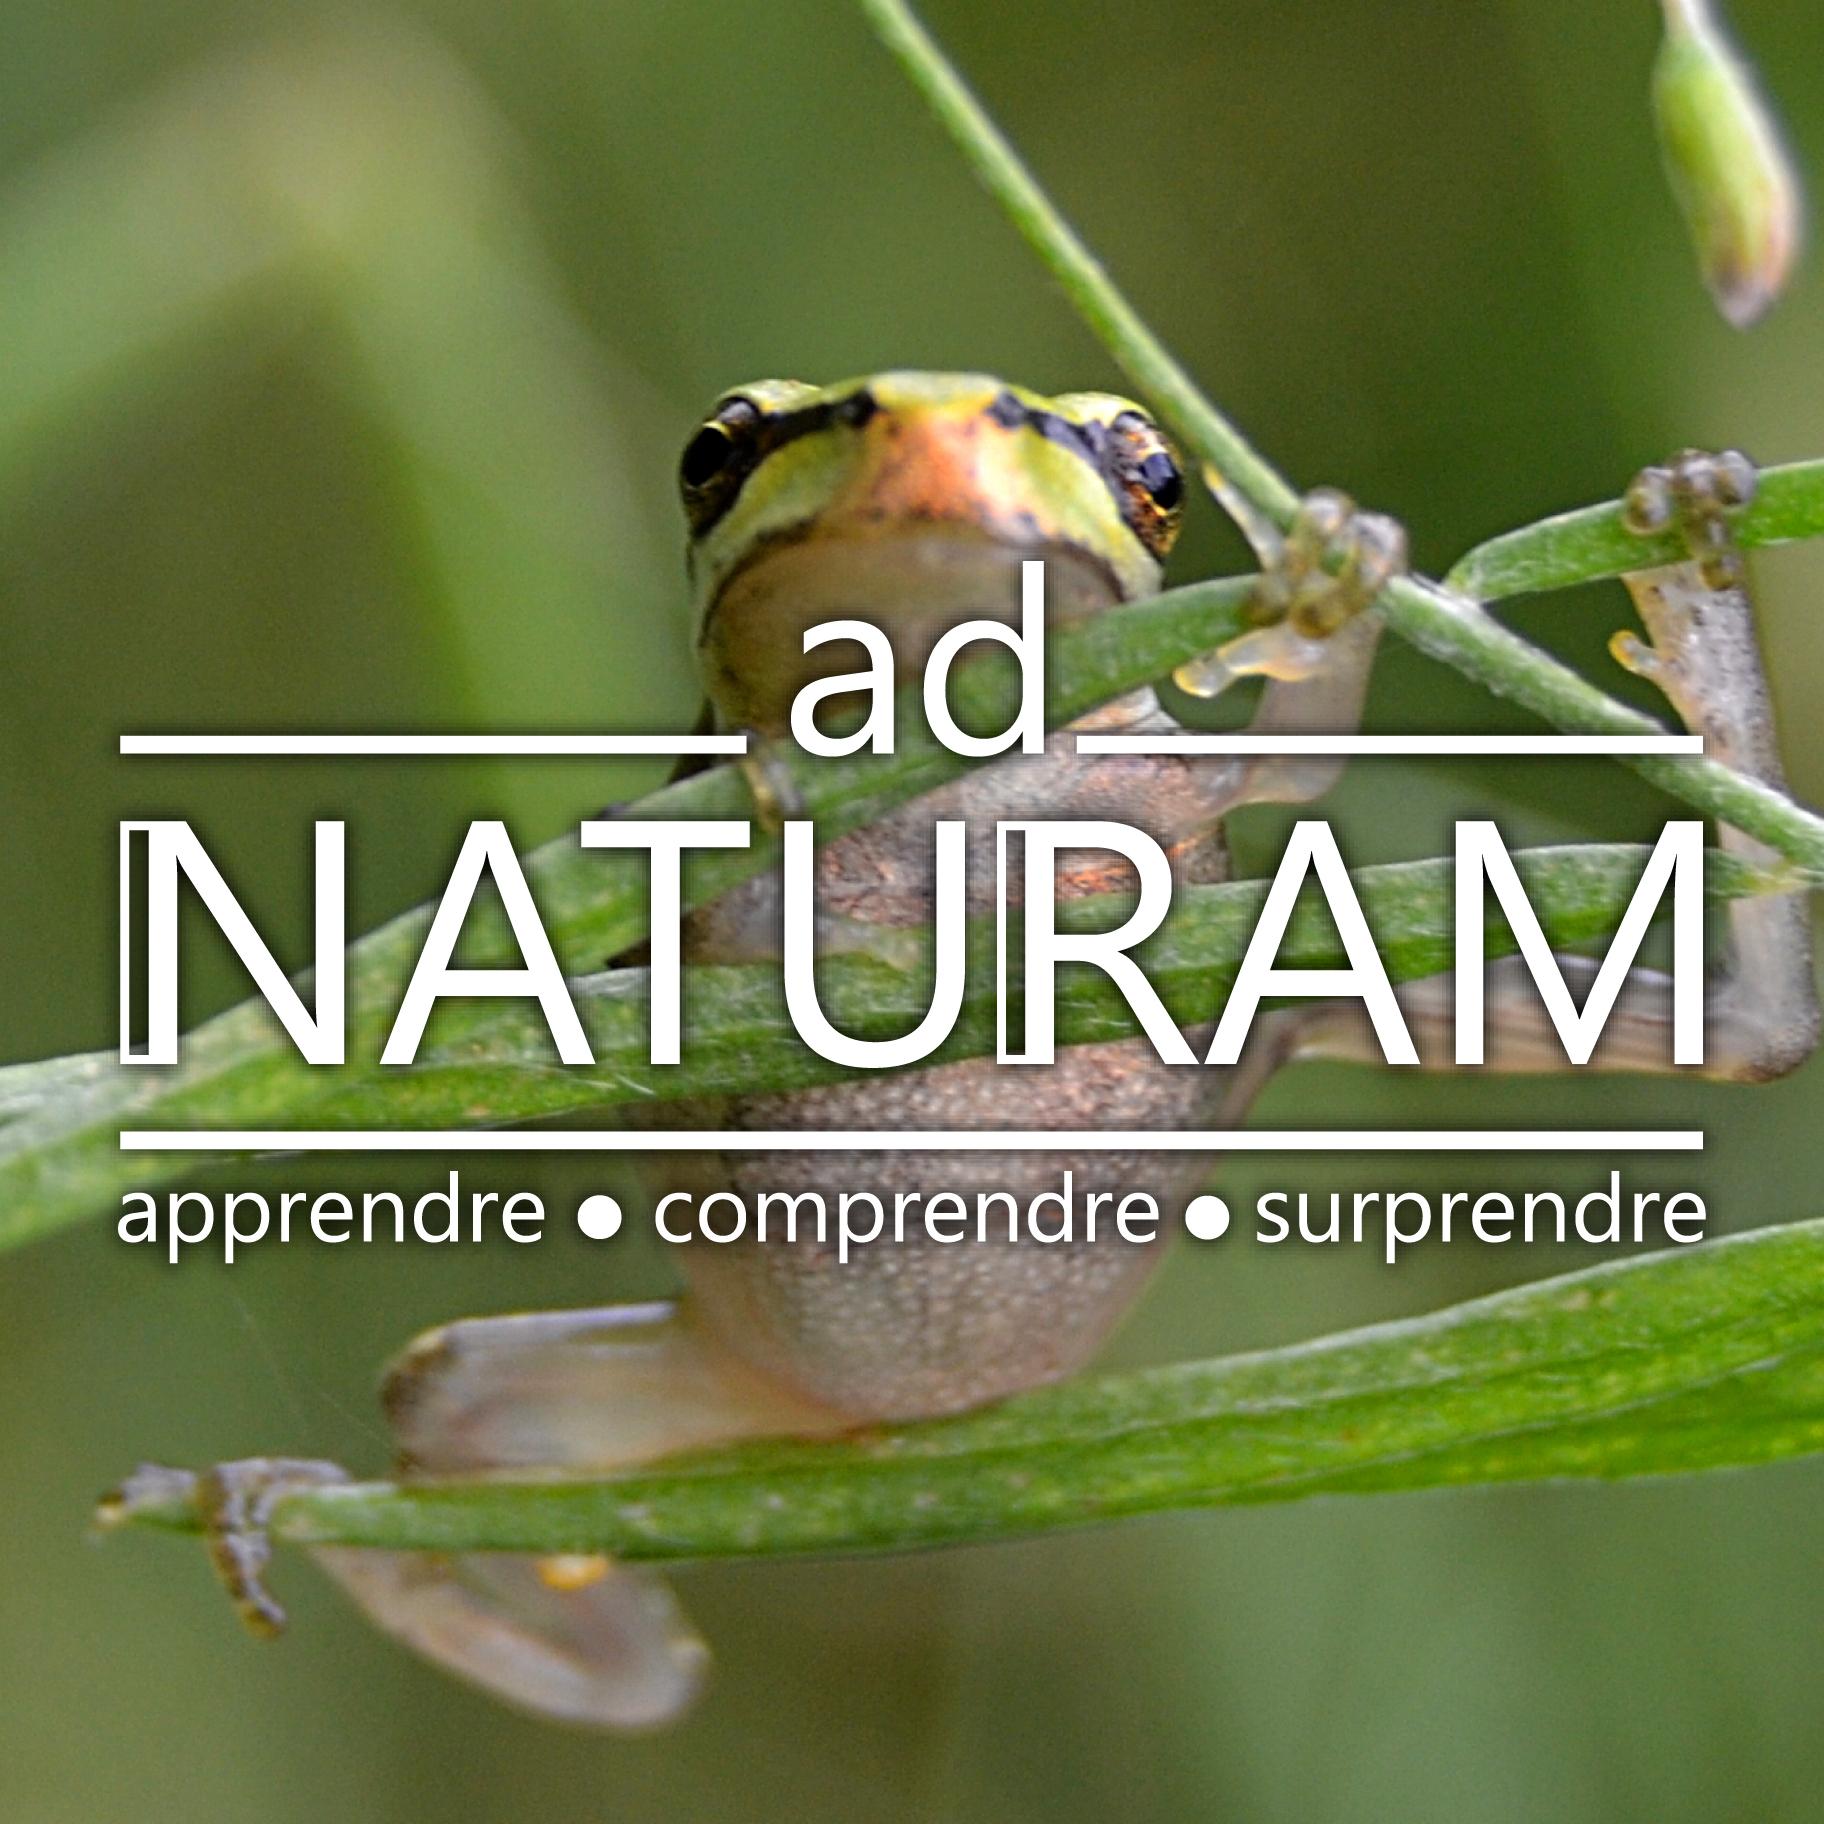 Ad Naturam